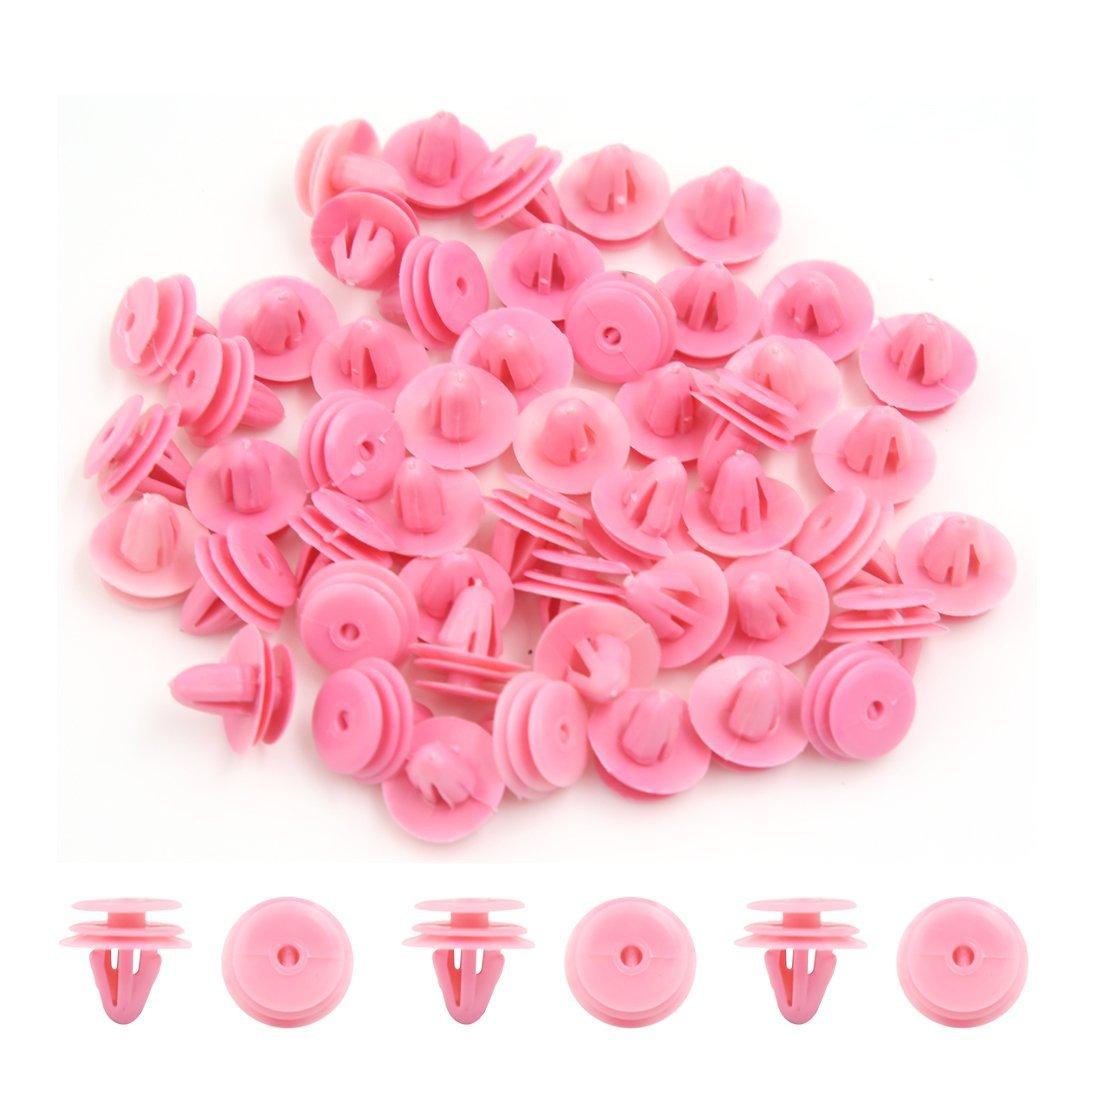 50Pcs 10mm Hole Pink Plastic Push in Rivet Interior Trim Panel Car Door Clips